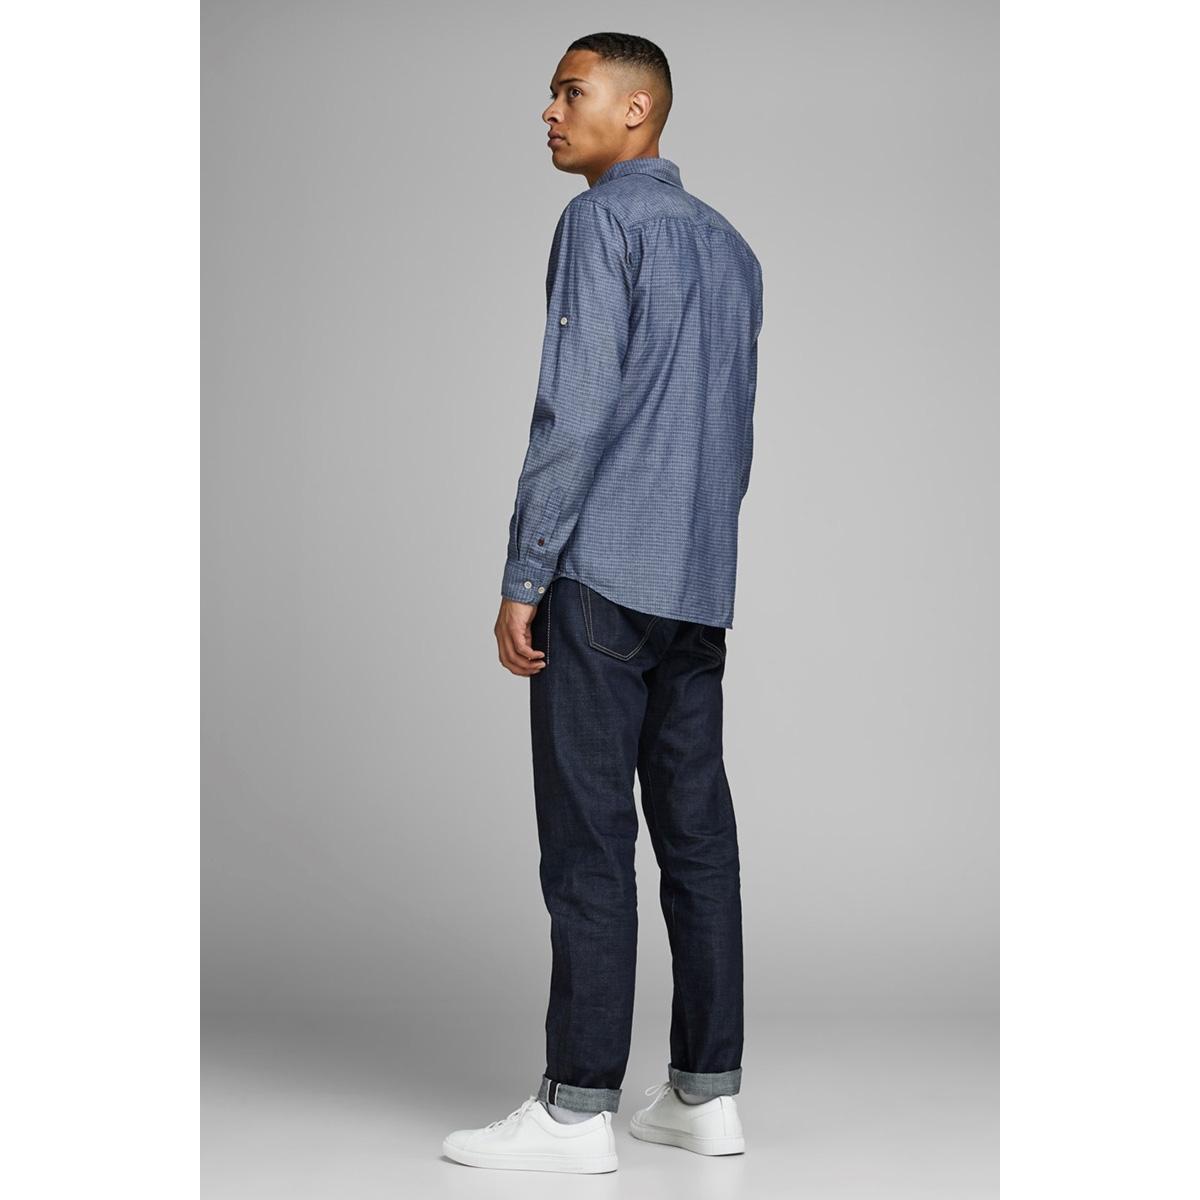 jprwesley mix shirt l/s one pocket 12162061 jack & jones overhemd faded denim